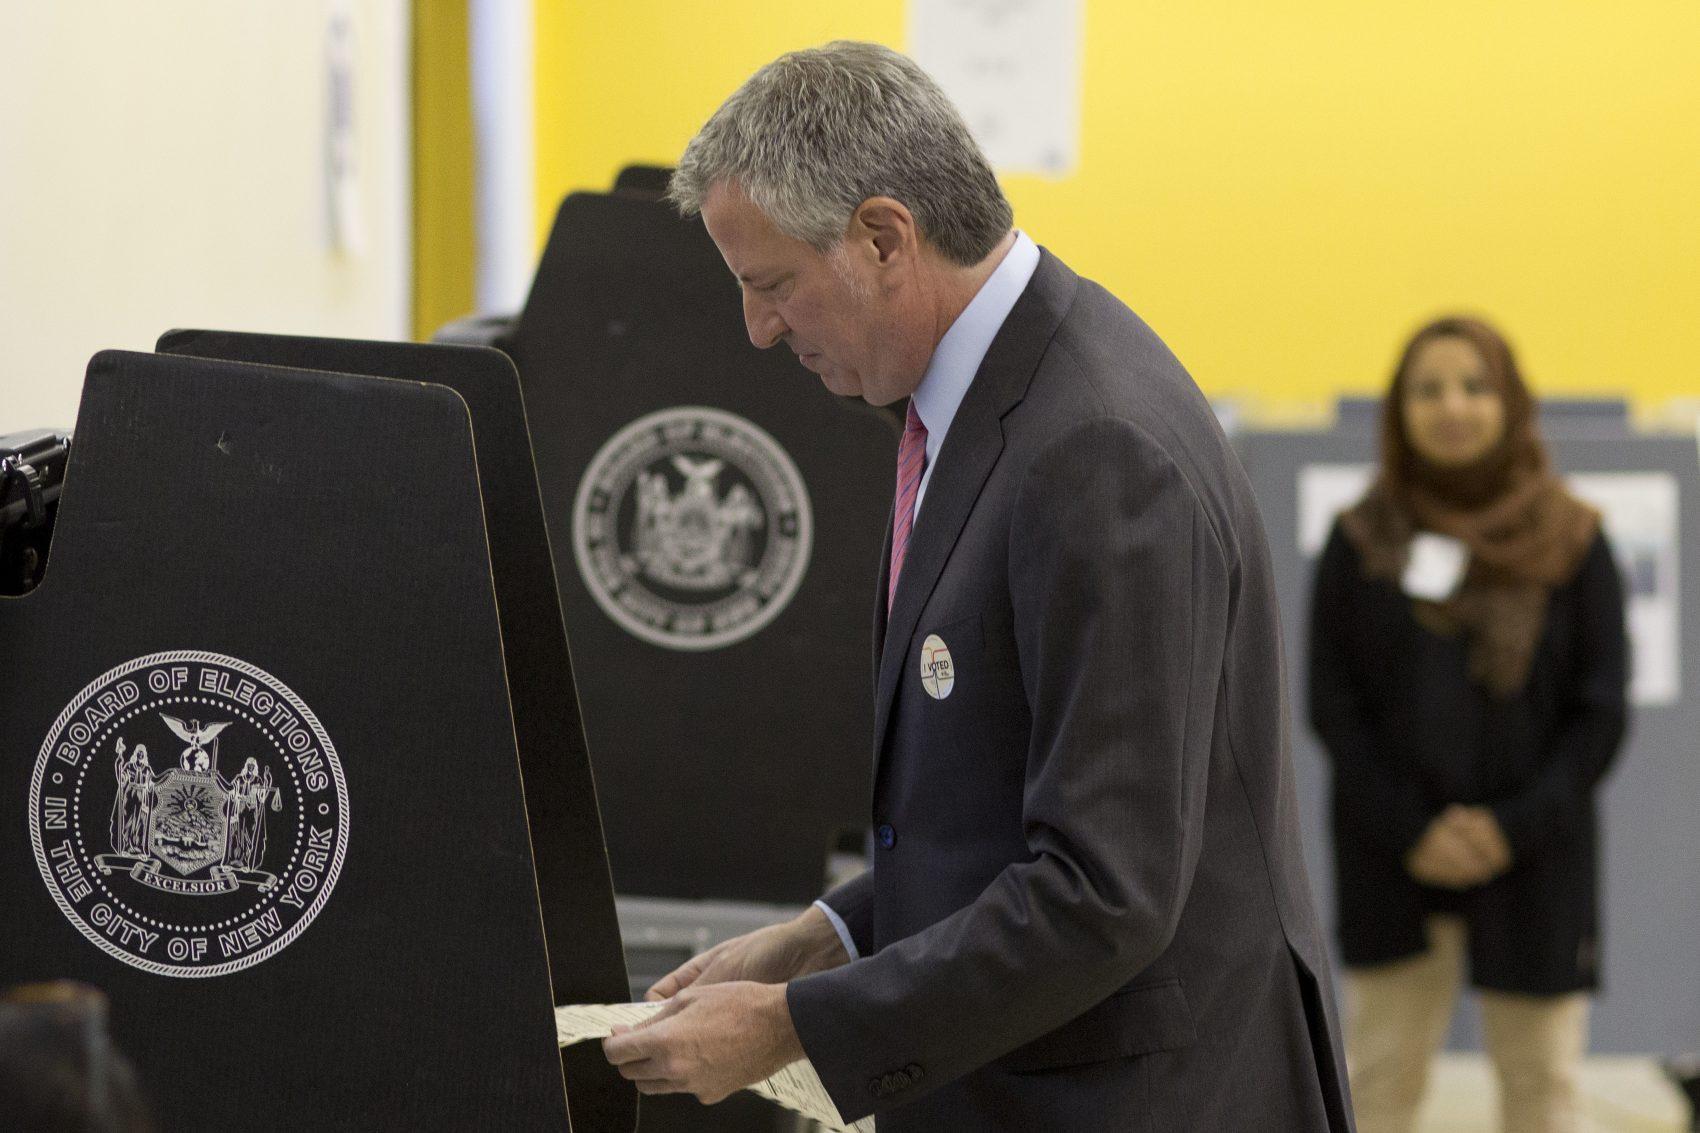 New York City Mayor Bill de Blasio wins low-turnout Democratic primary